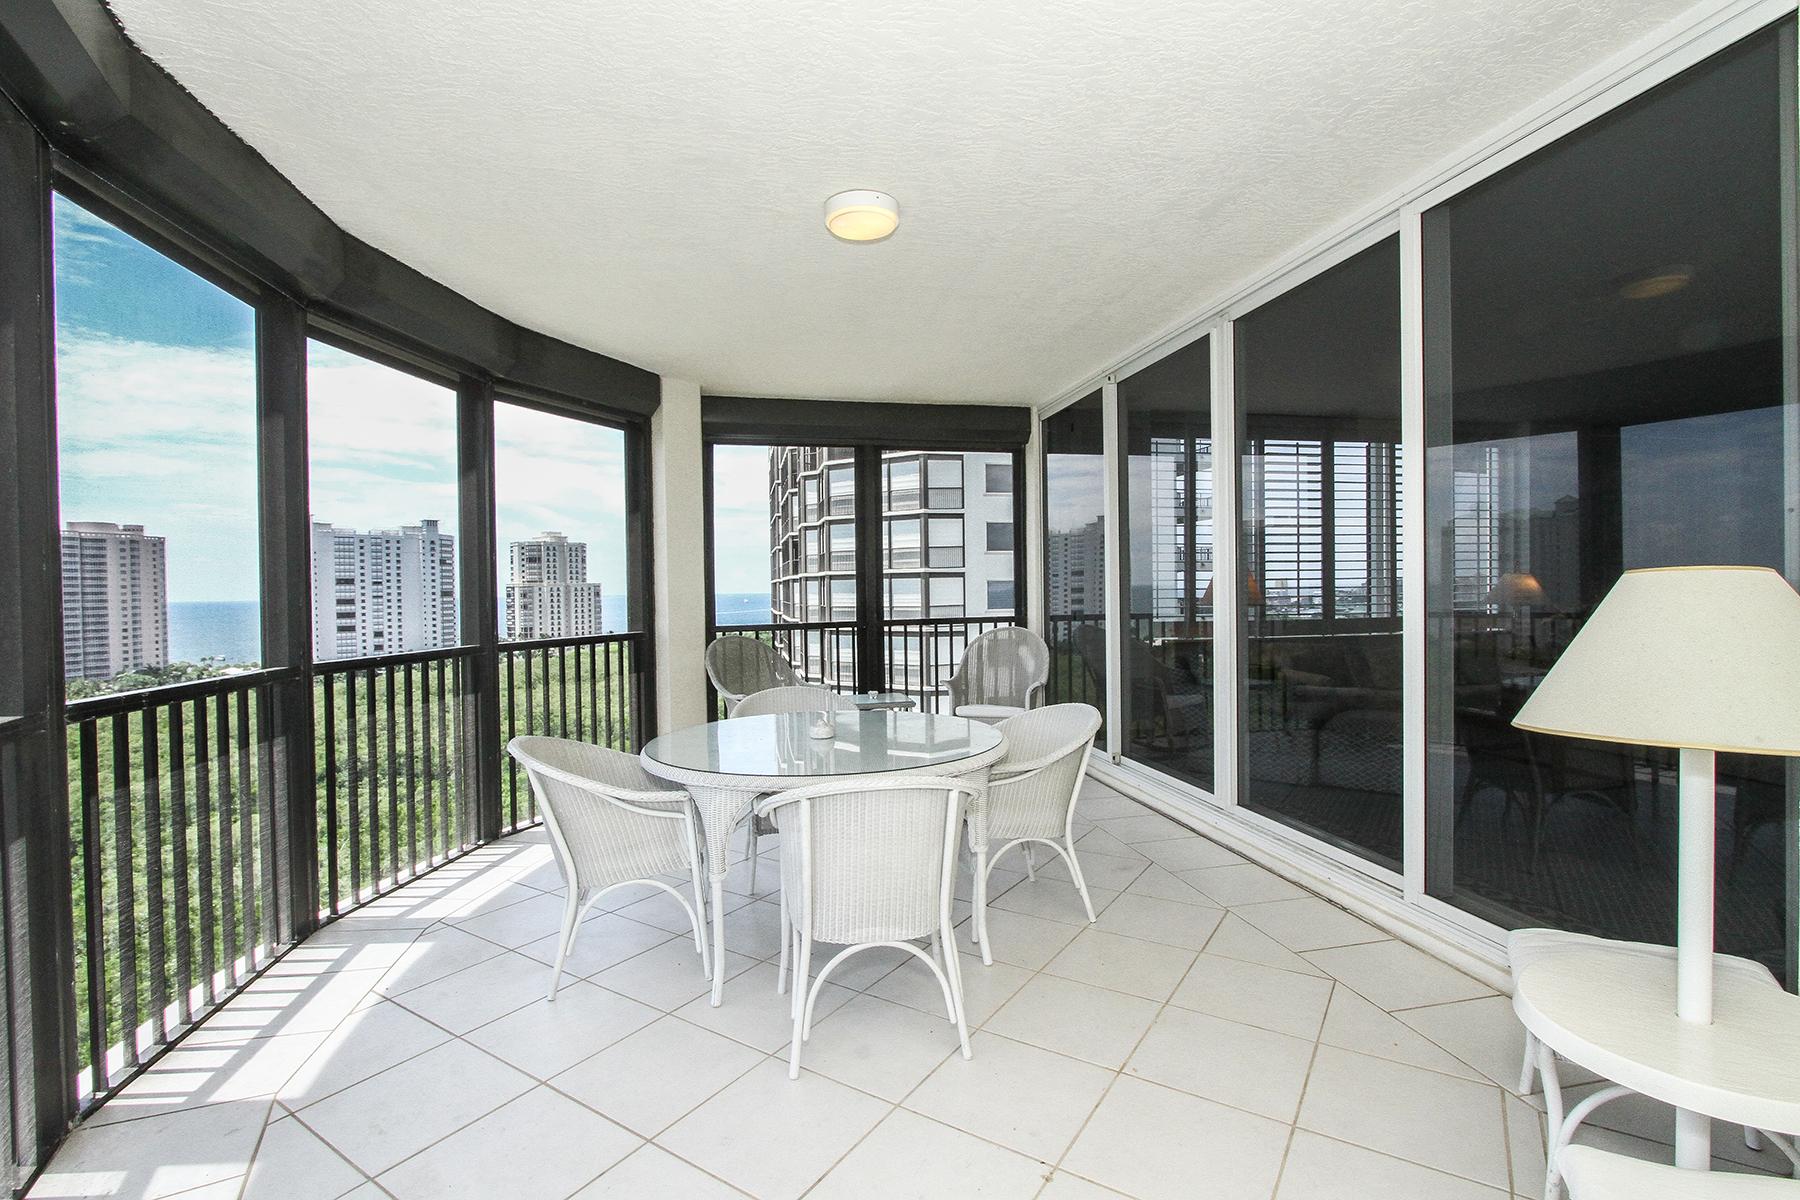 rentals property at PELICAN BAY-MARQUESA AT BAY COLONY